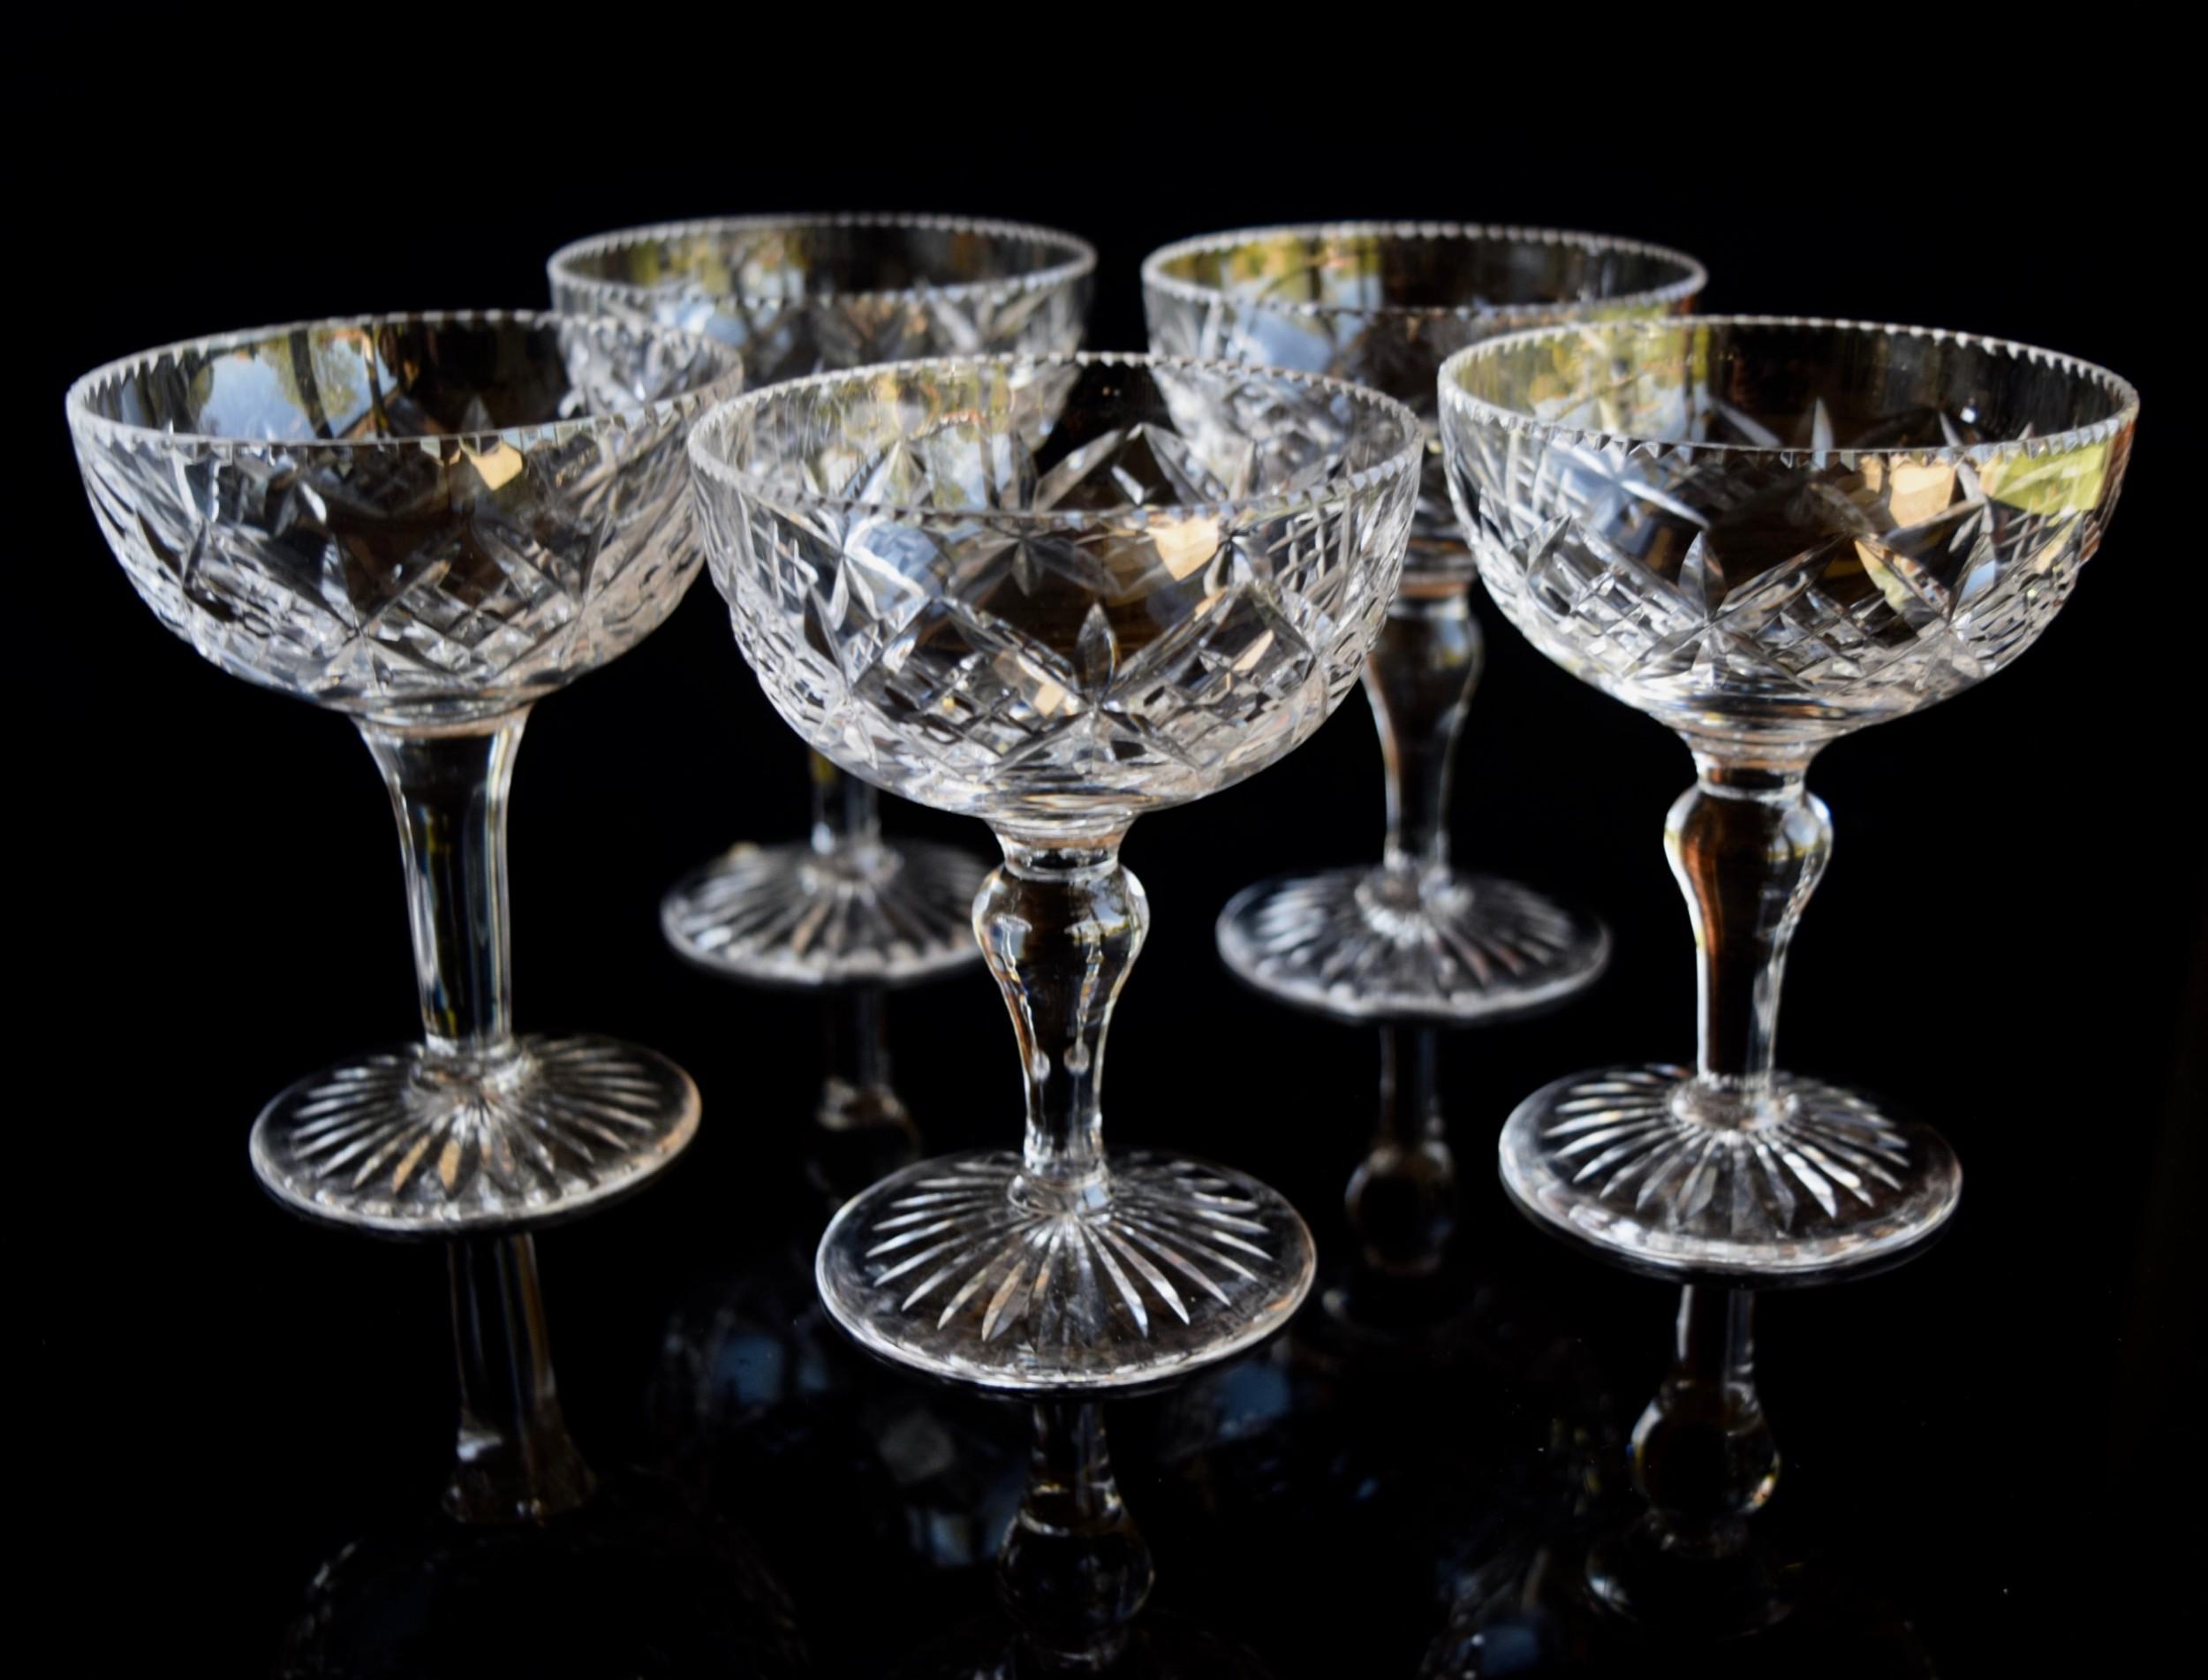 5 stuart crystal champagne glasses houndstooth rims